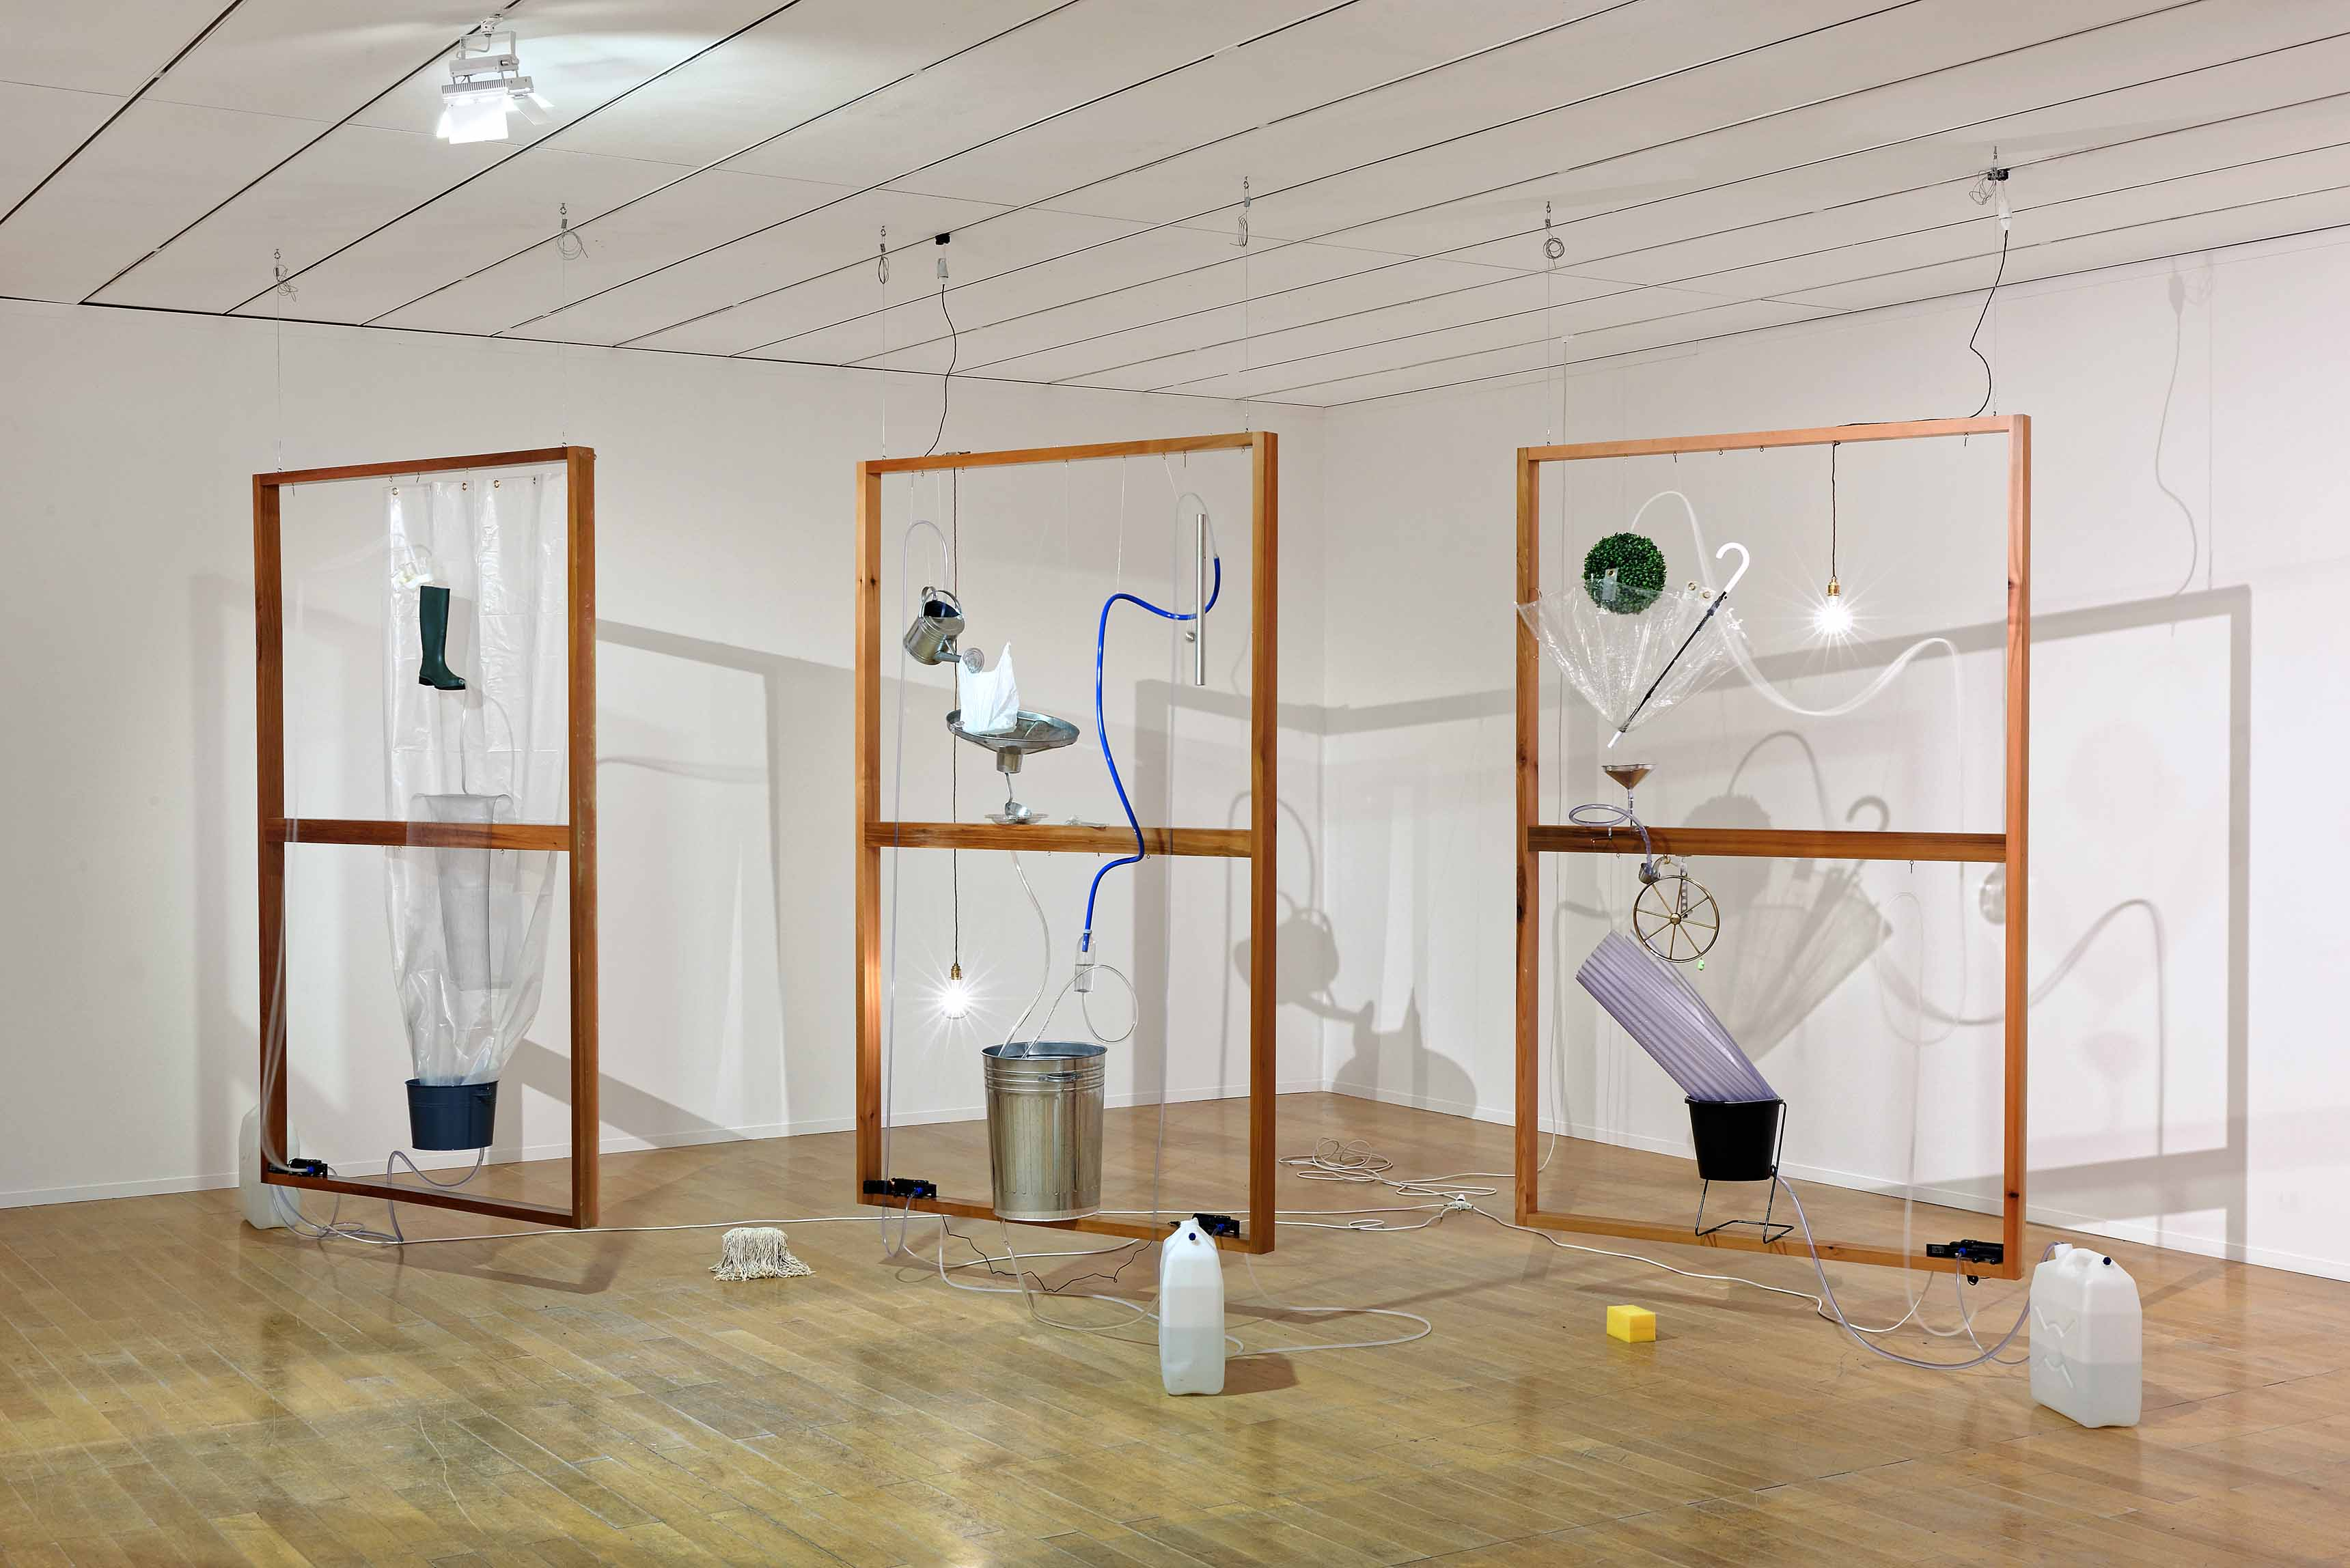 MOHRI Yuko, Moré Moré [Leaky] The Falling Water Given #4-6, 2017, Courtesy de l'artiste, de la Biennale de Lyon 2017 et White Rainbow, ©Blaise Adilon